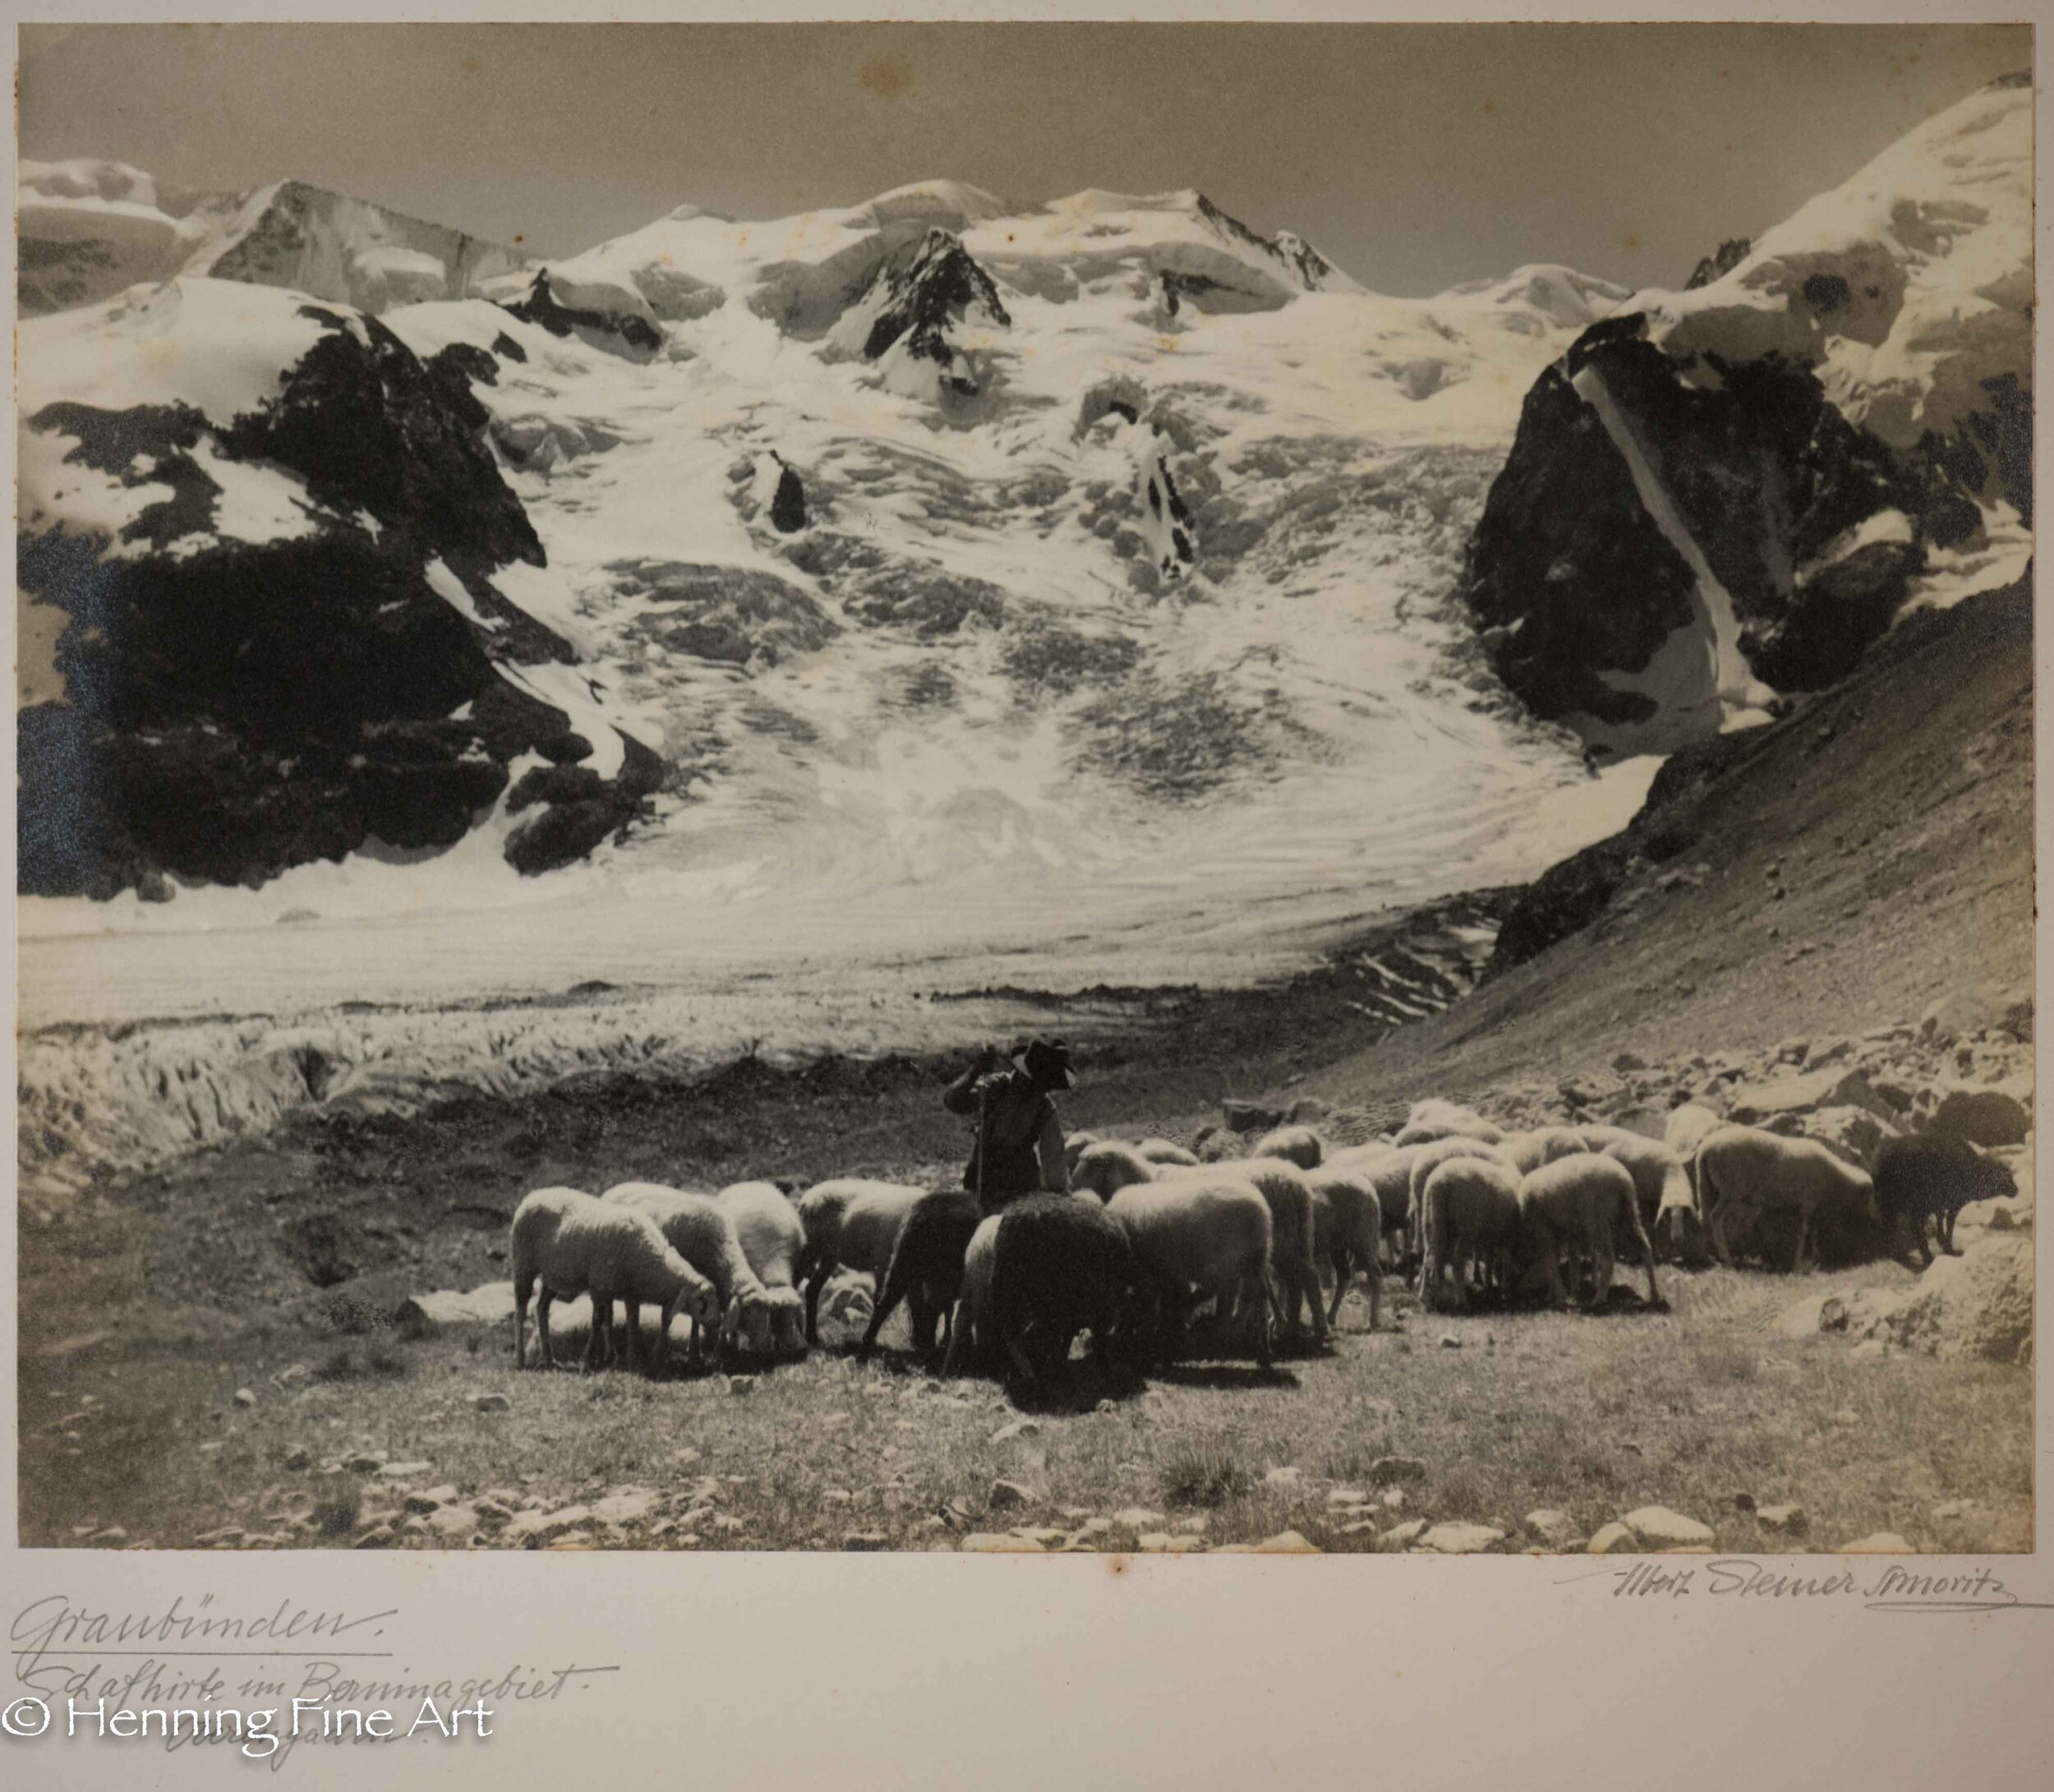 "Albert Steiner (1877 - 1965) ""Graudunden. Schafhirte im Berninagebiet. - Oberengaden.""  Image (6-3)"